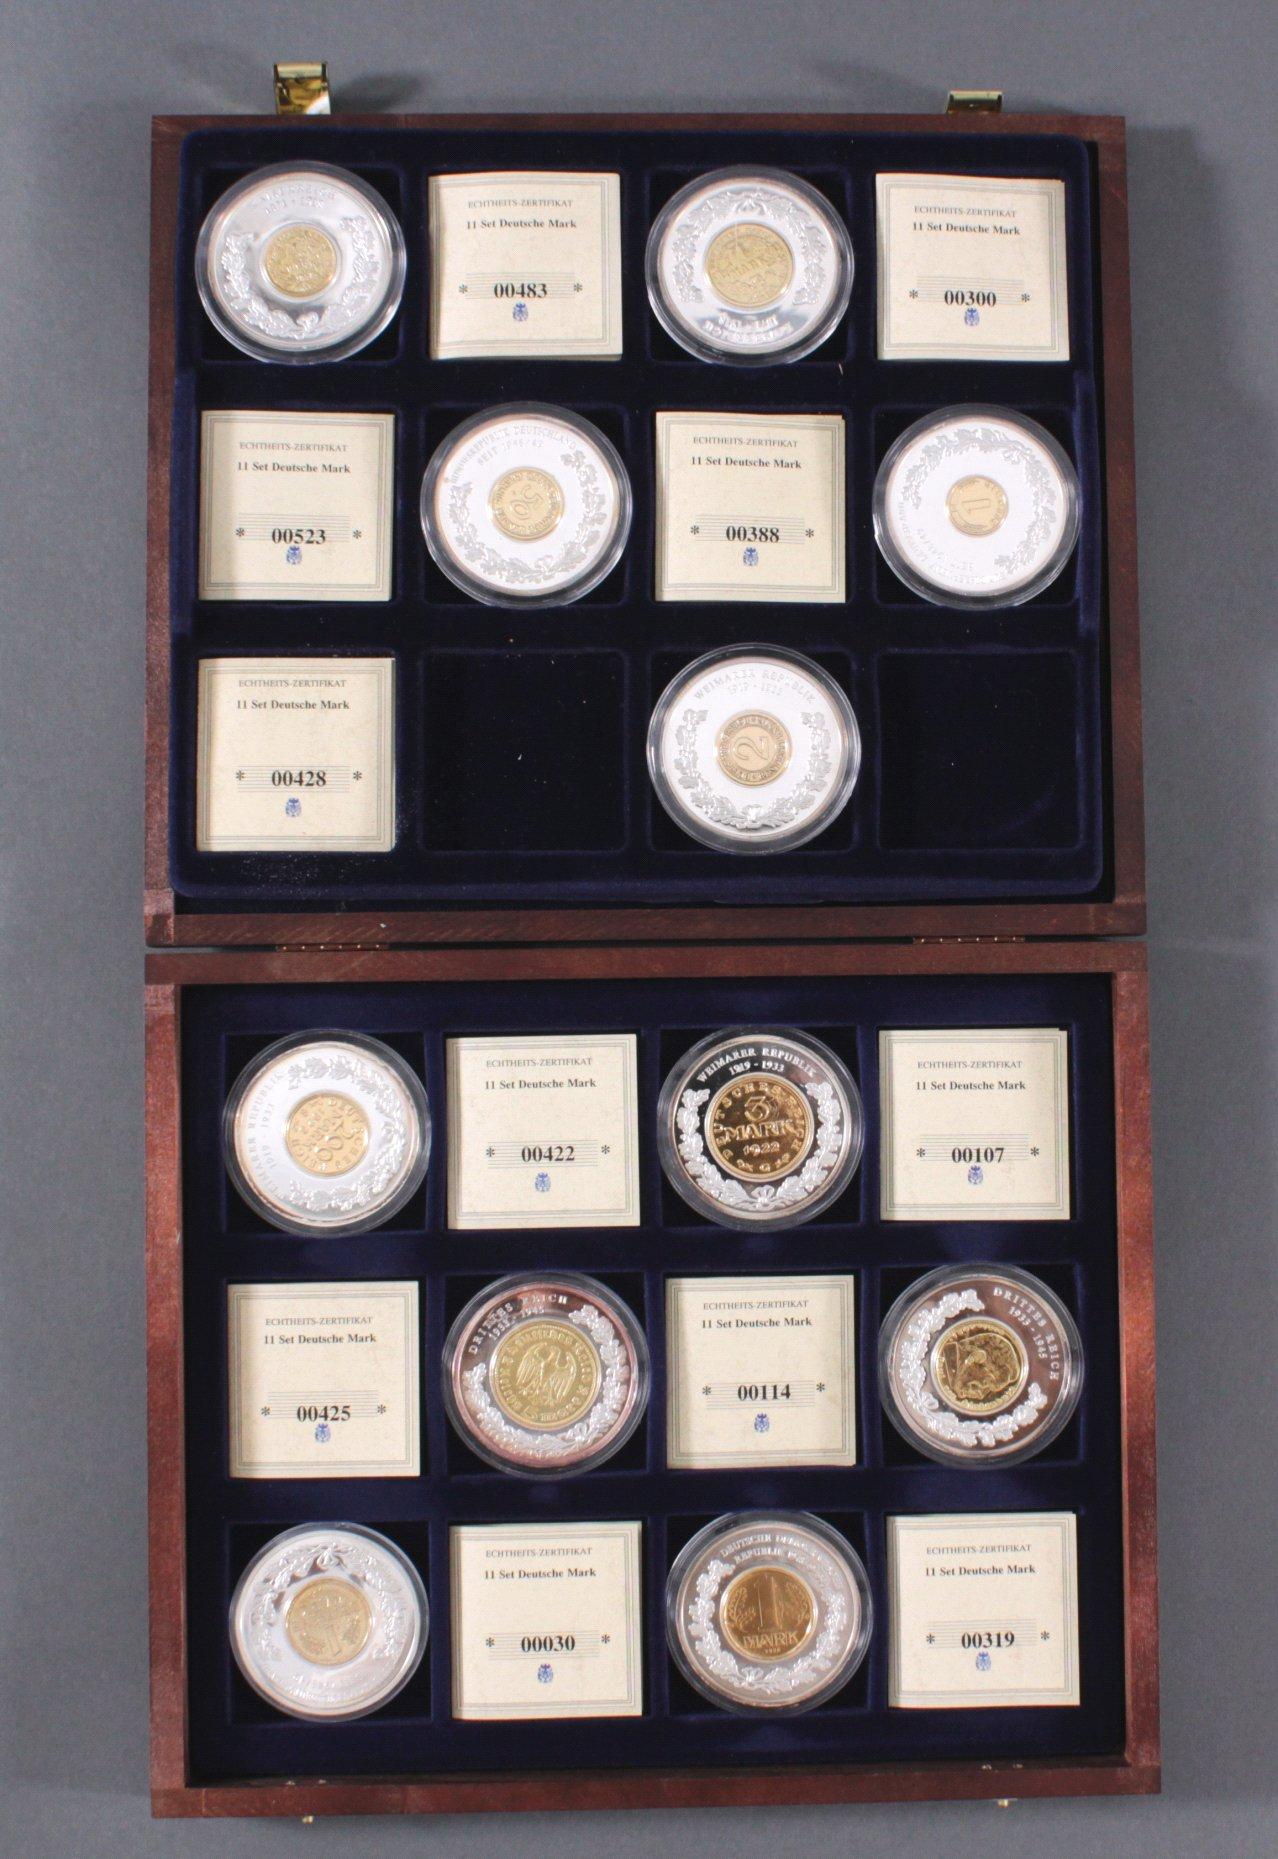 11 Medaillen Deutsche Mark